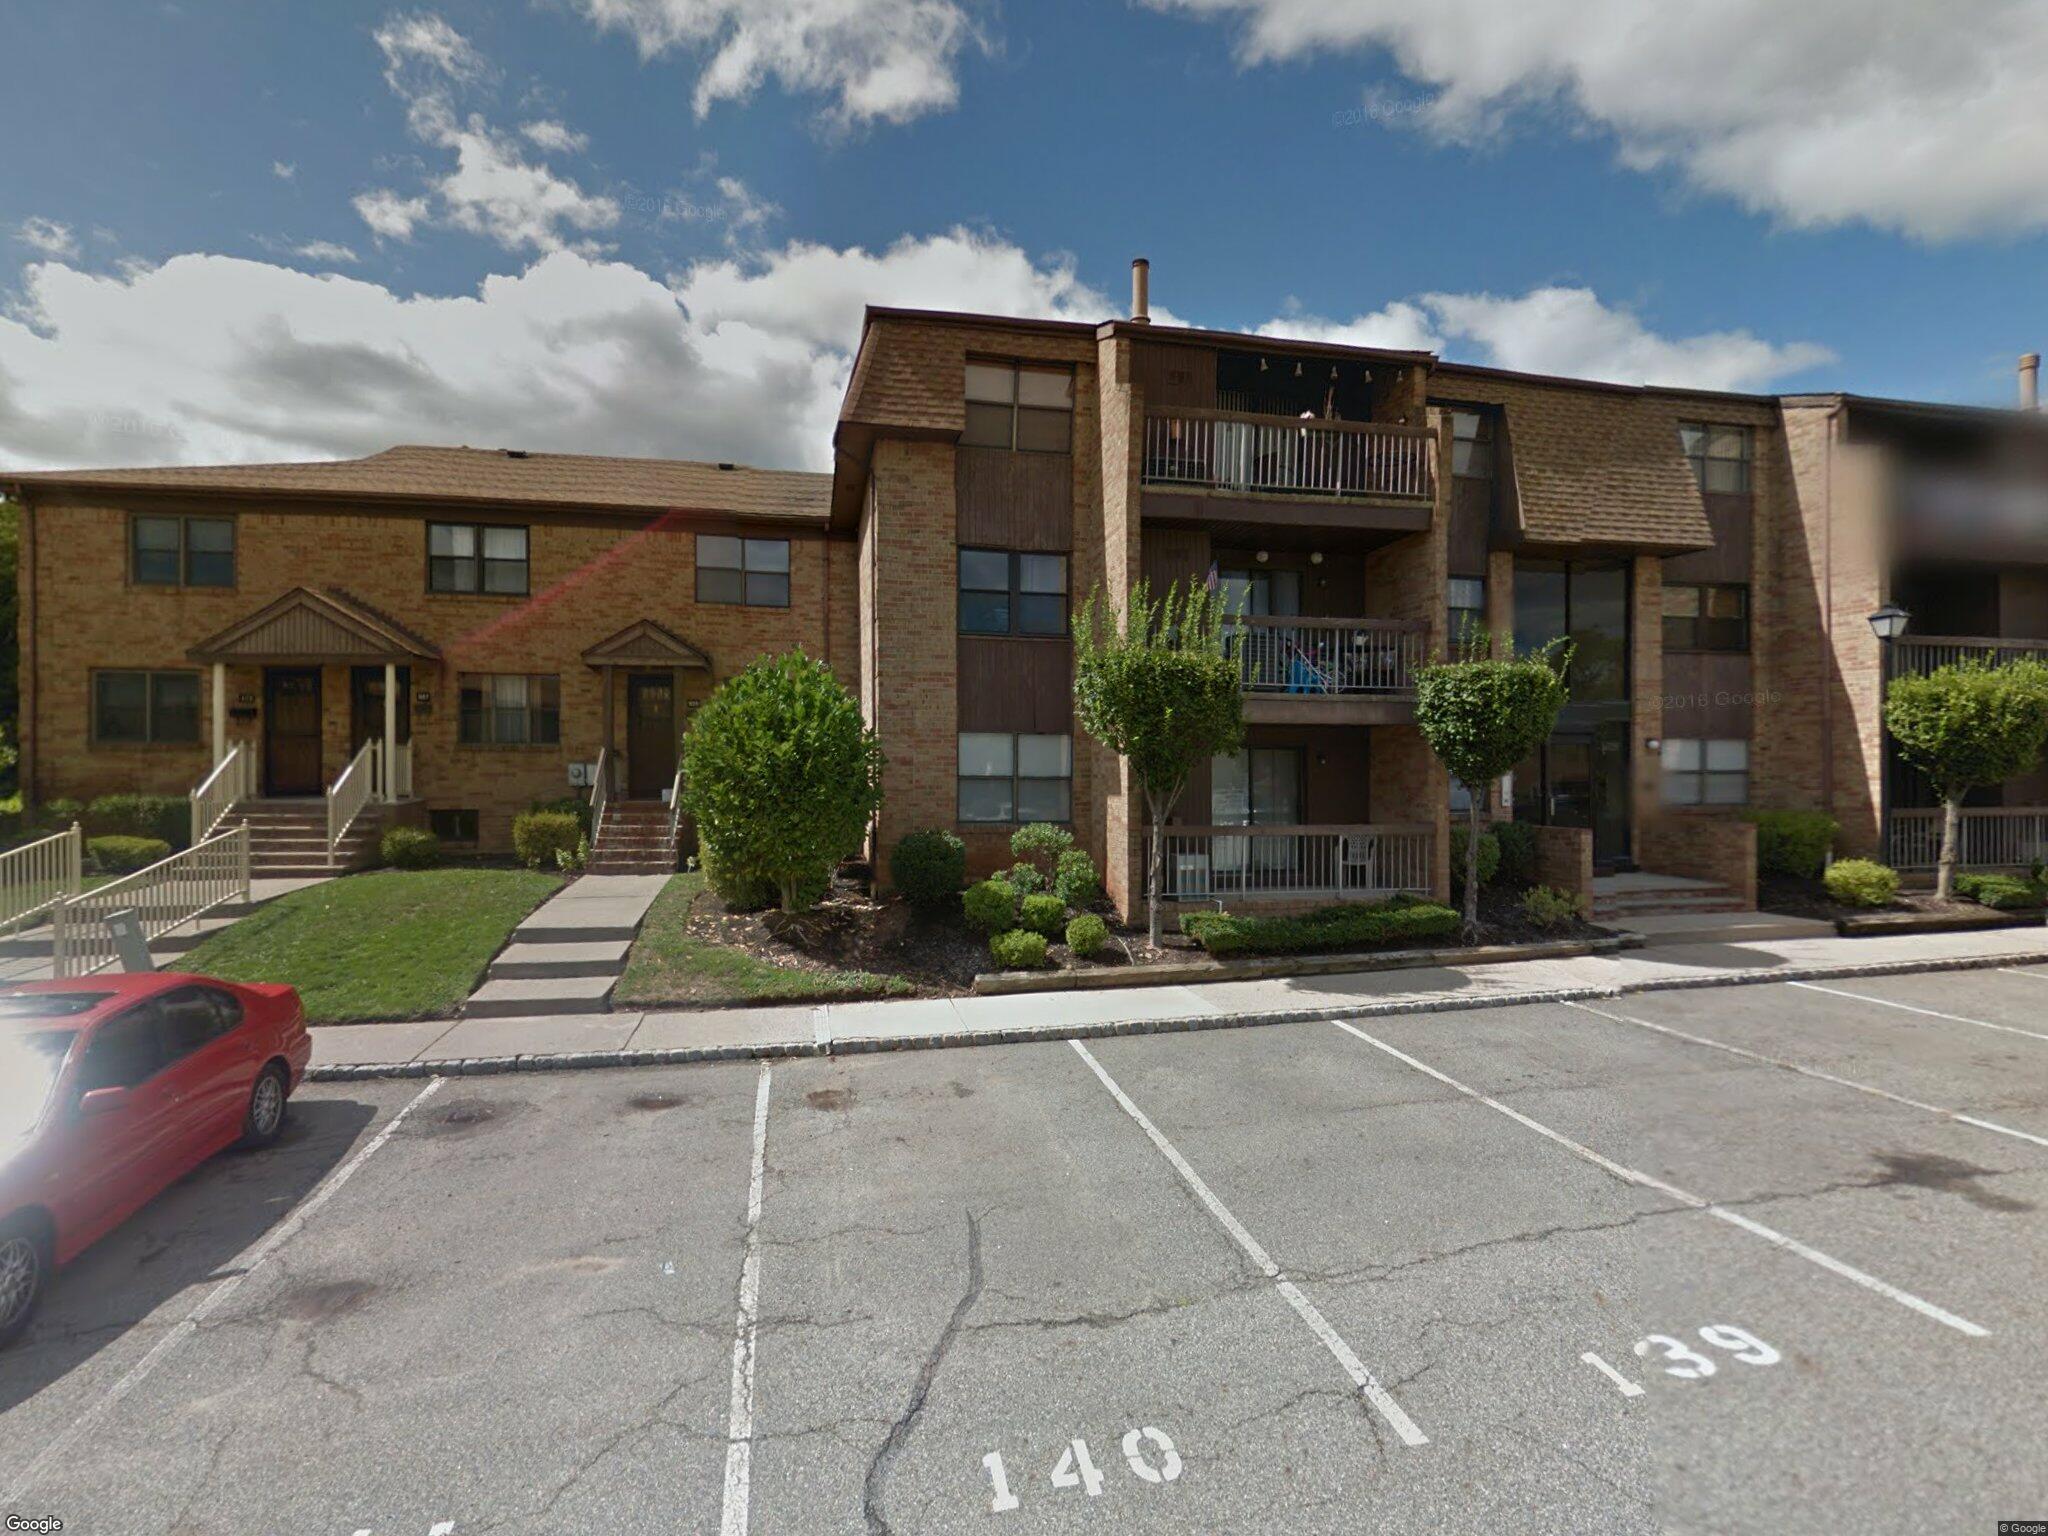 620 Sharon Garden Ct, Woodbridge, NJ 07095 - Foreclosure | Trulia